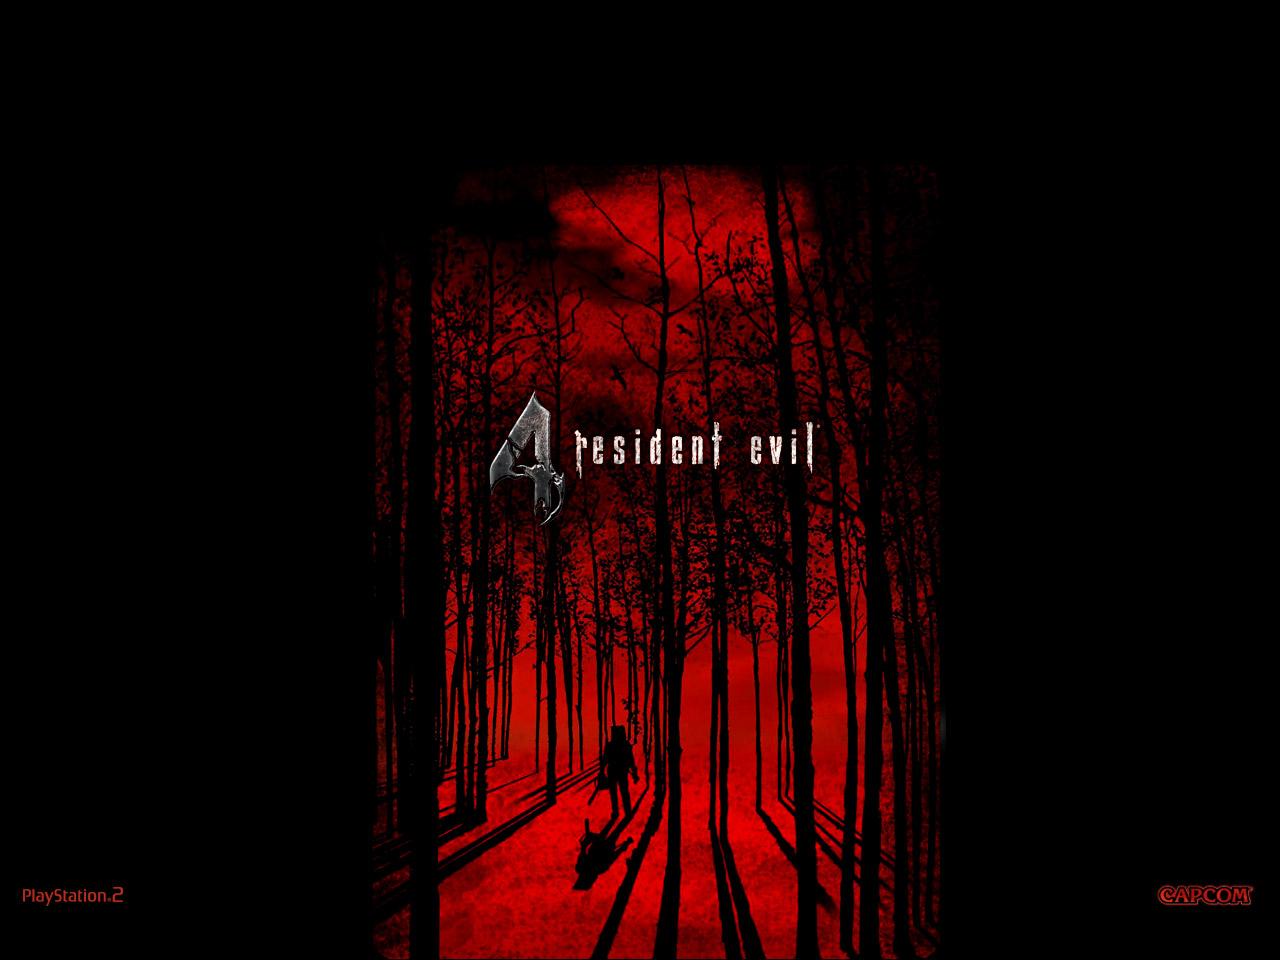 http://2.bp.blogspot.com/_NANRJ_MxJZA/TGV5DYHJzmI/AAAAAAAAAD0/zJU8TMVKPPw/s1600/Resident_Evil_4_1.jpg